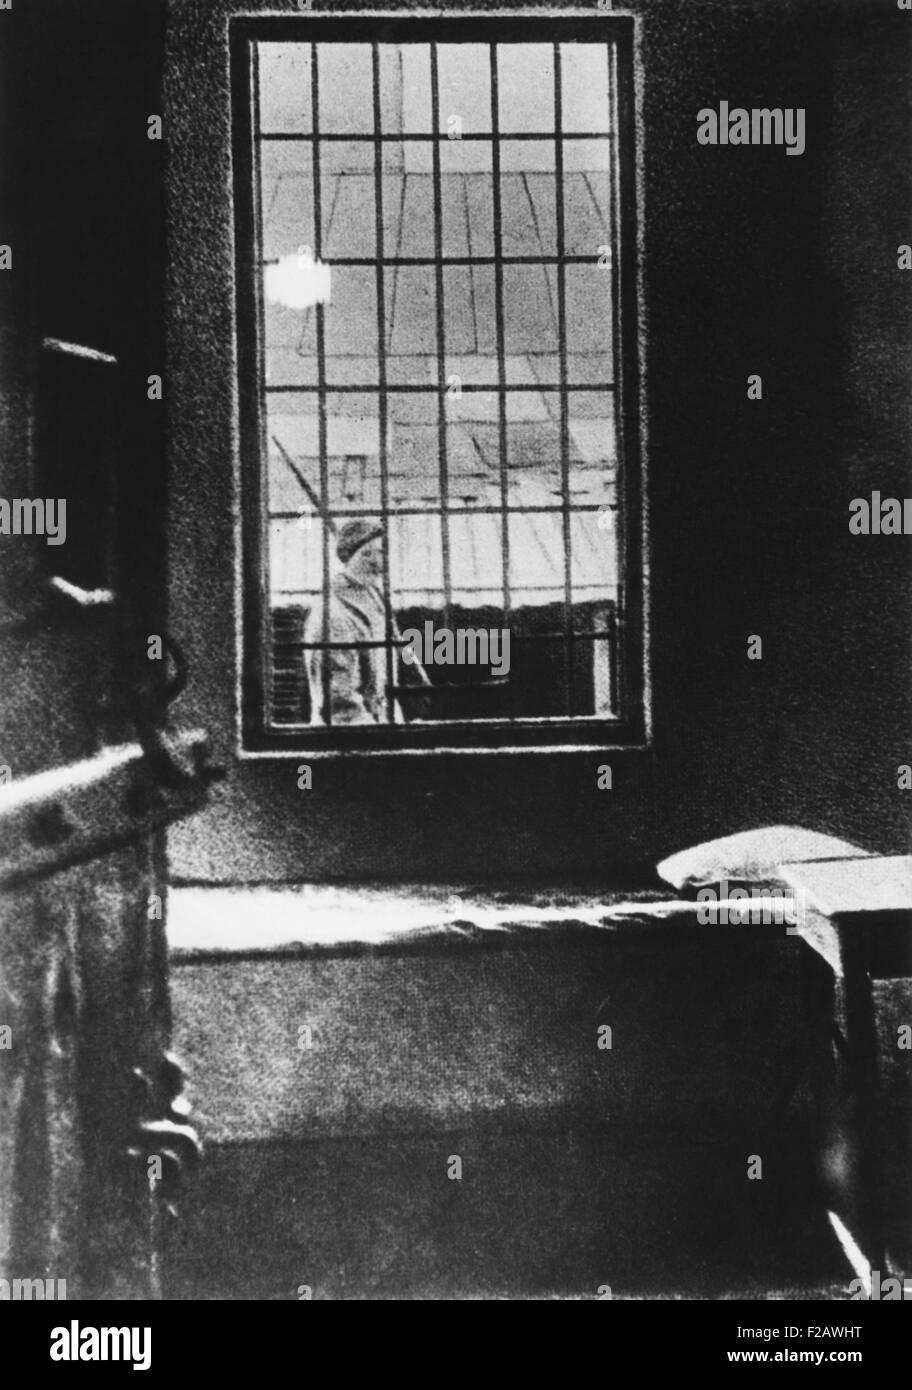 Josef Stalin occupied this cell in the Batumi Prison of Transcaucasia in 1903. (CSU_2015_11_1365) - Stock Image